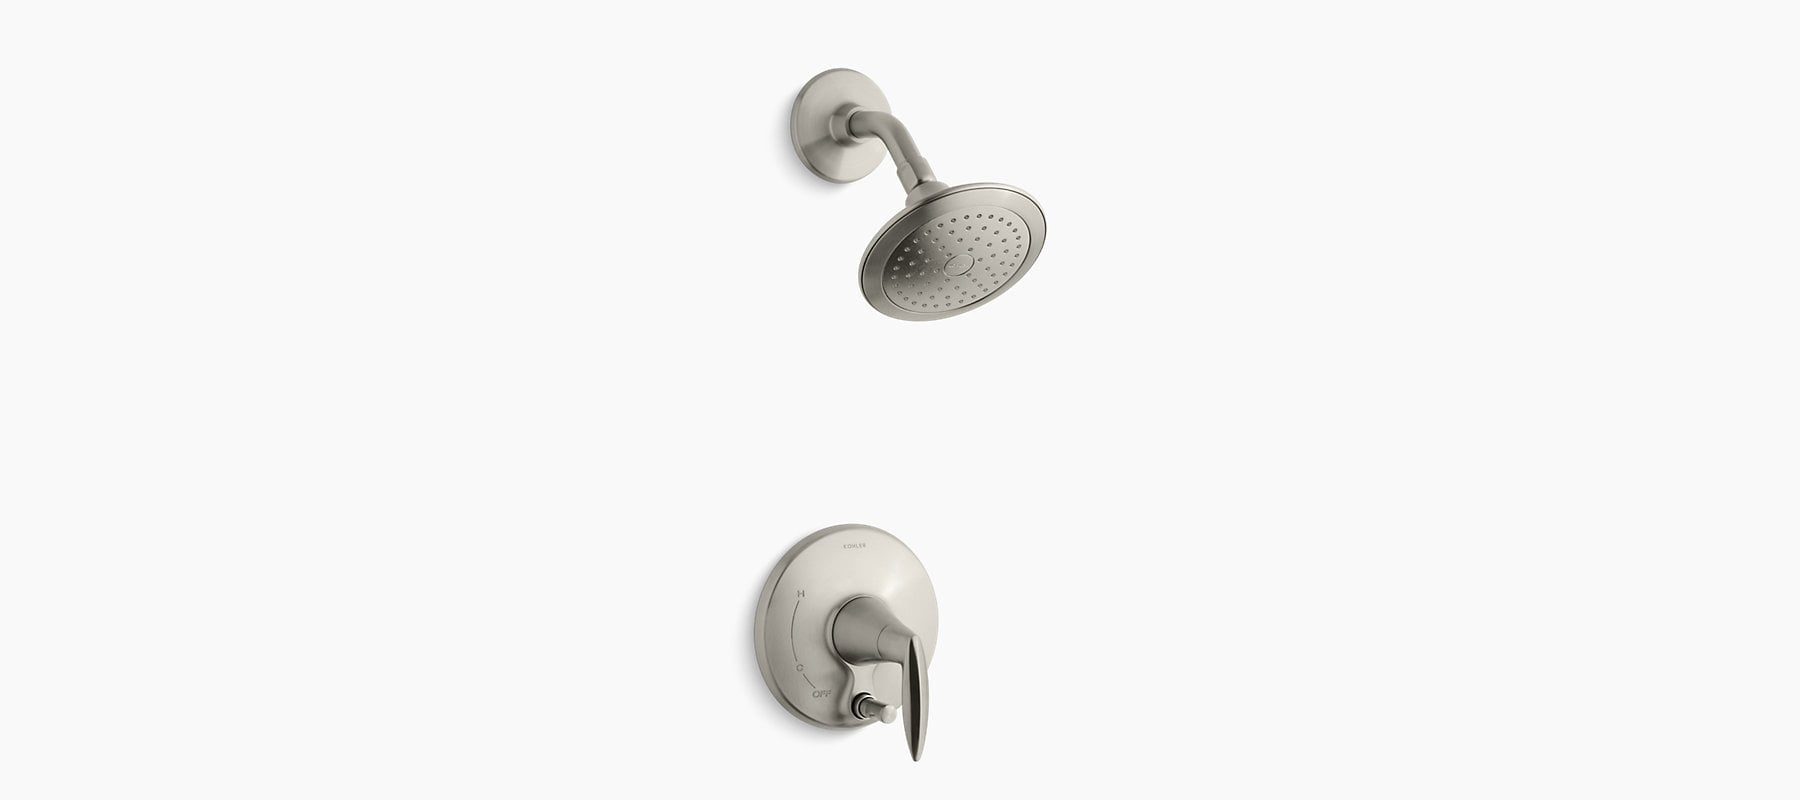 Kohler - Alteo Shower Trim Only w/Push-Button Diverter Without Valve 150853921